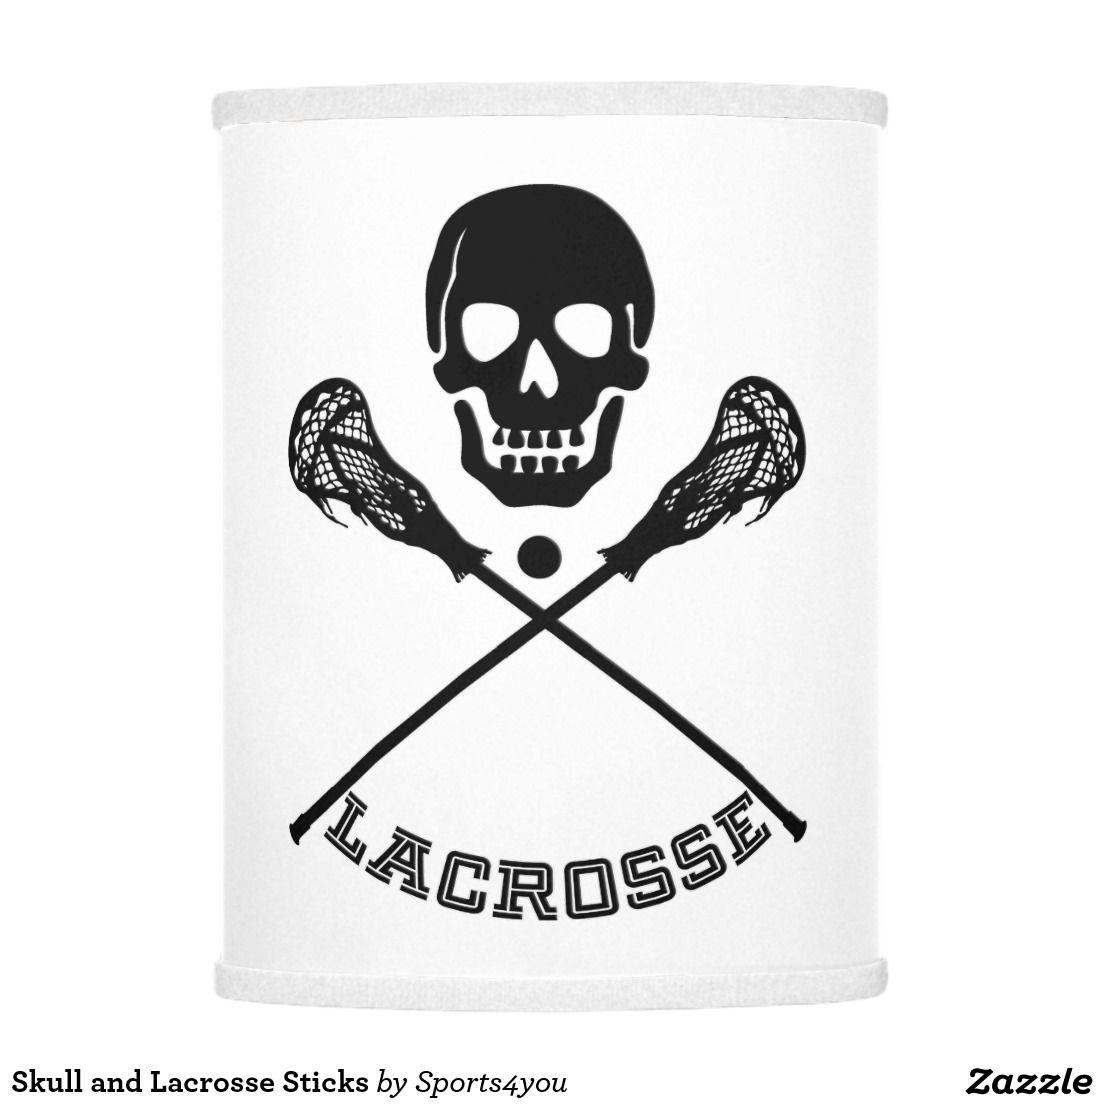 Skull And Lacrosse Sticks Lamp Shade Zazzle Com Wall Graphics Lacrosse Sticks Lamp Shade [ 1104 x 1104 Pixel ]